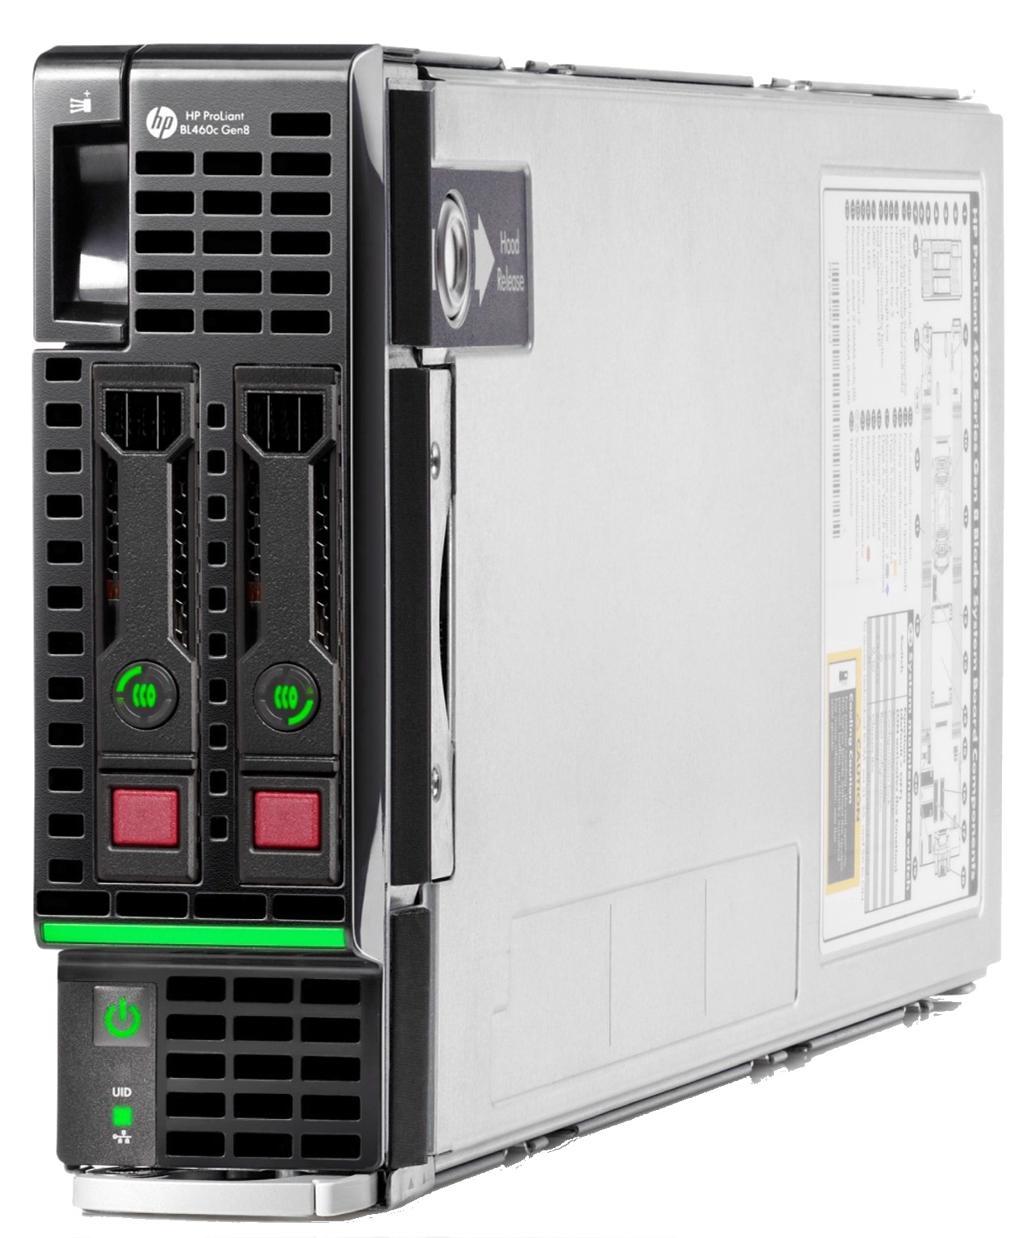 HP ProLiant BL460c Gen8 Blade Server (2P) Xeon Eight Core E5 (2670) 2.6GHz 64GB-R (no HDD) SAS/SATA/SSD (Integrated Matrox G200)